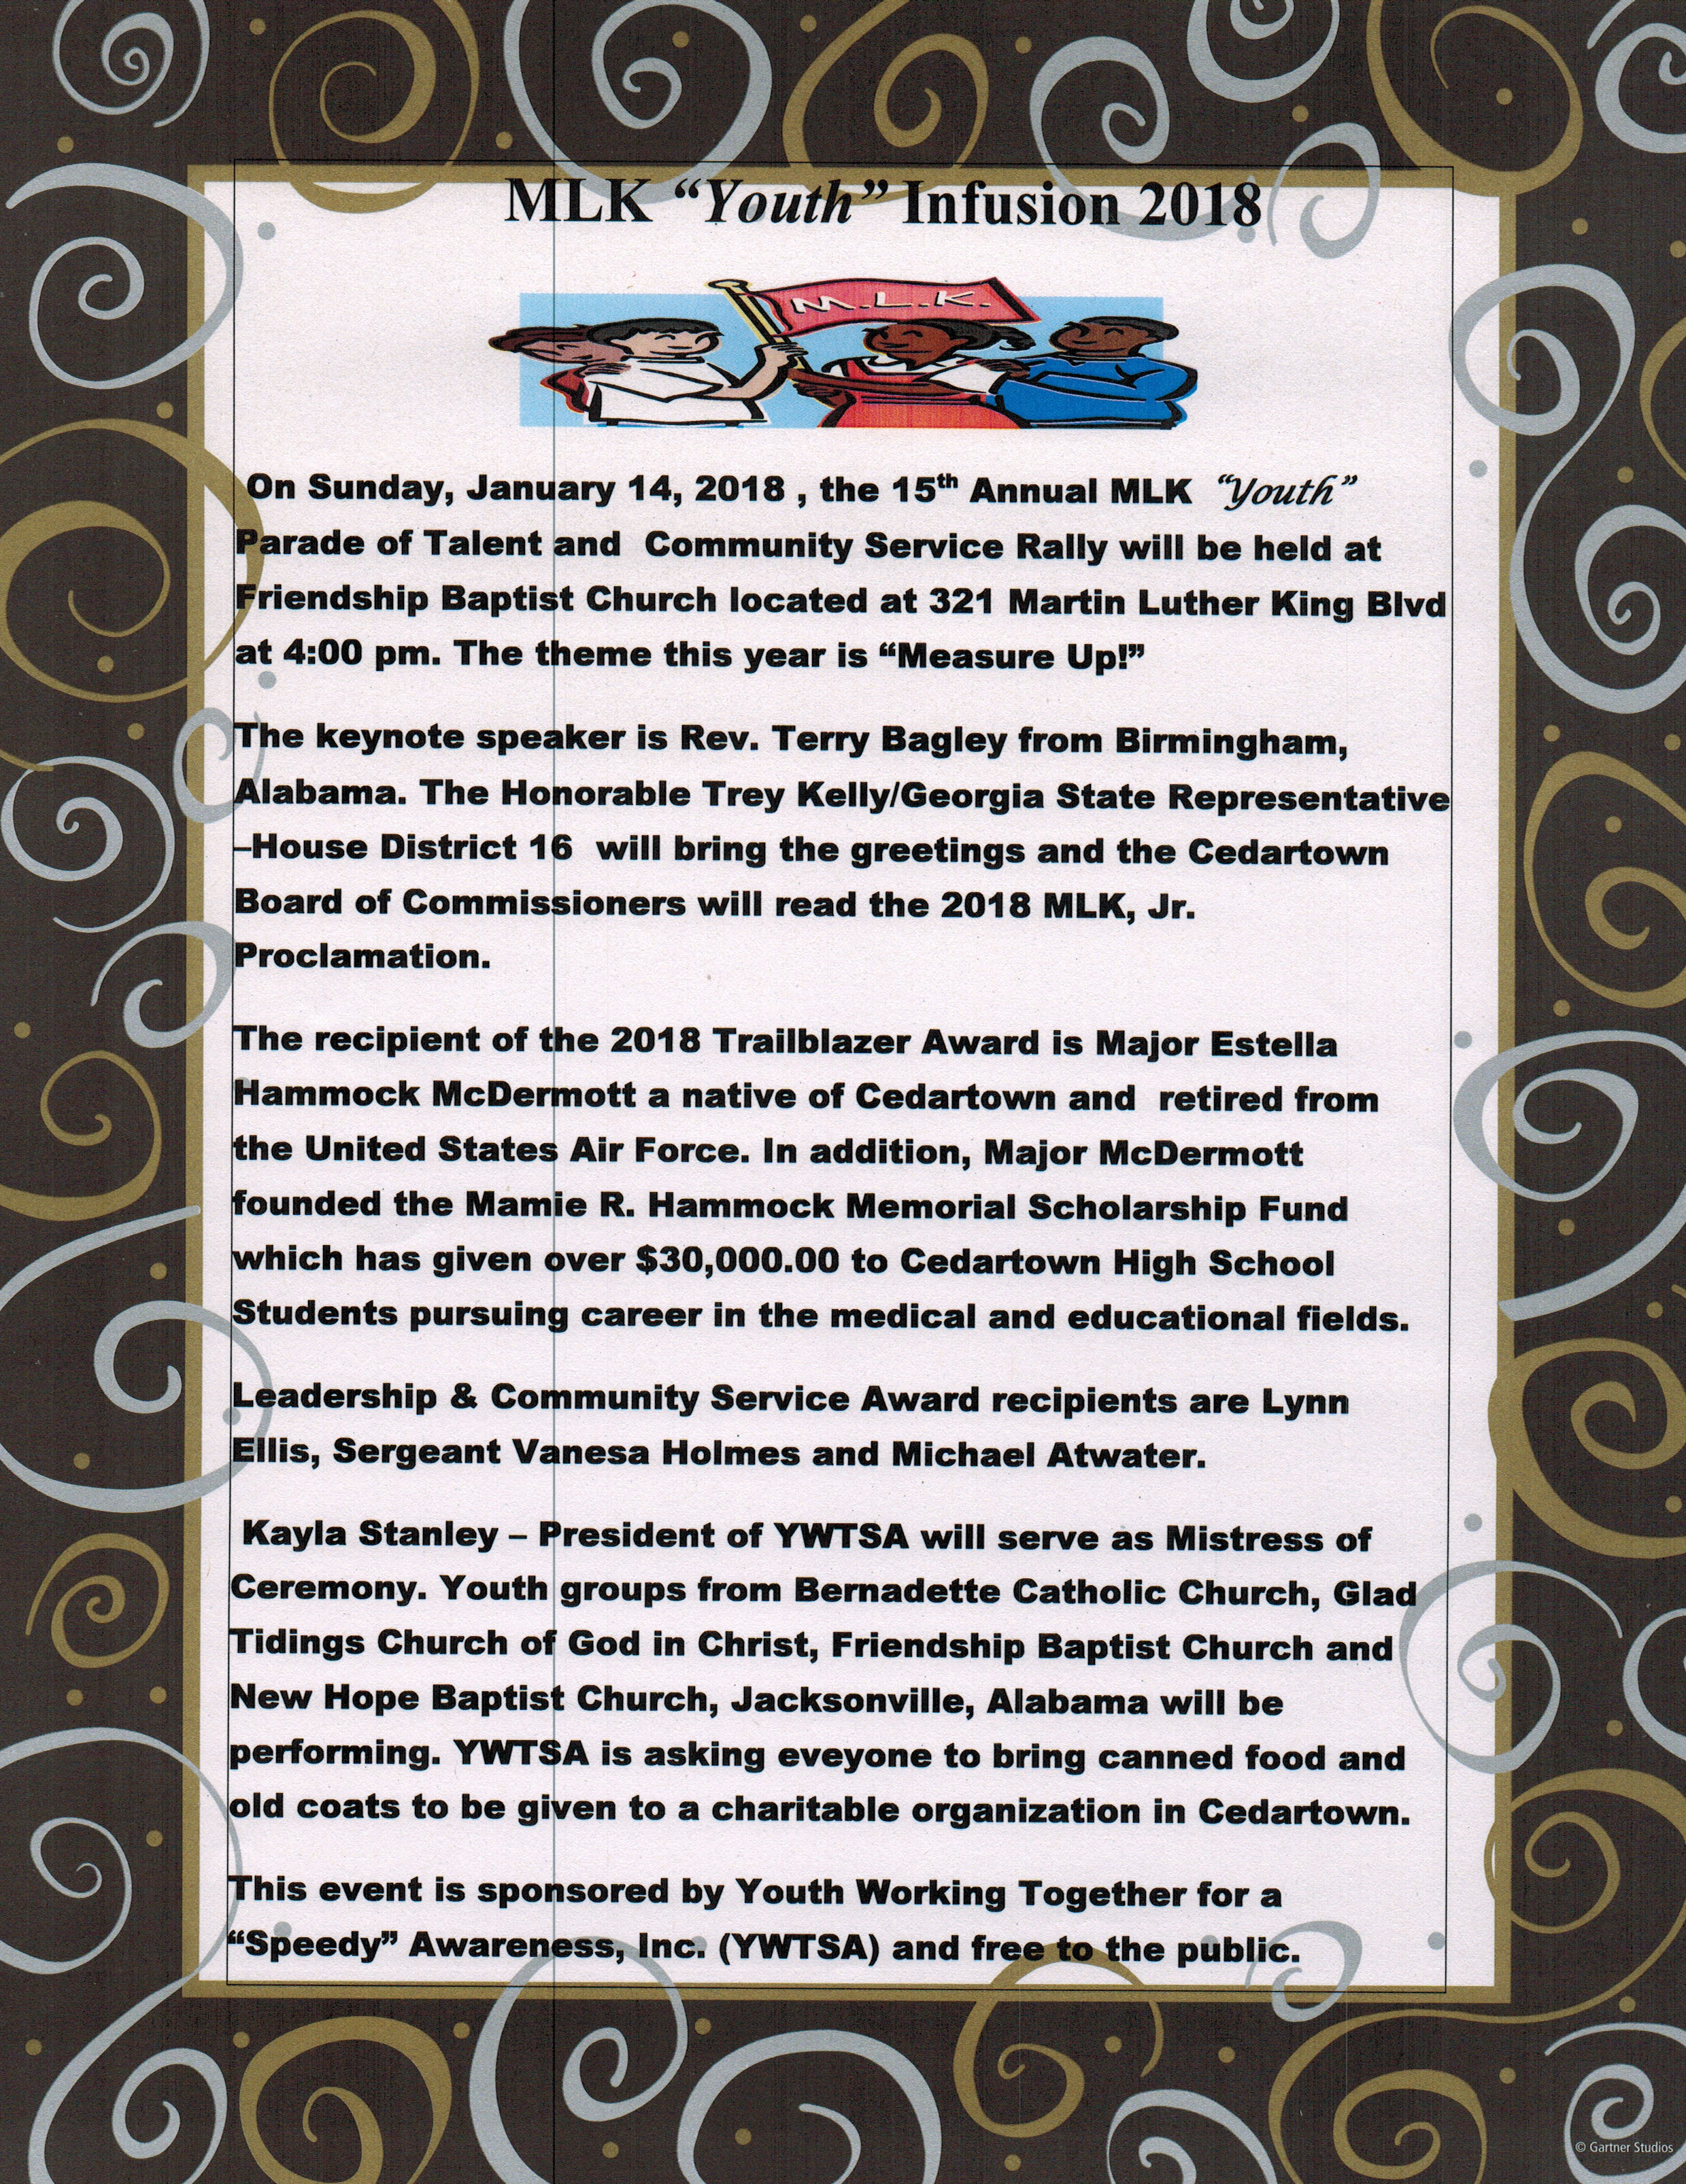 Mlk Youth Infusion 2018 Wgaa Radio